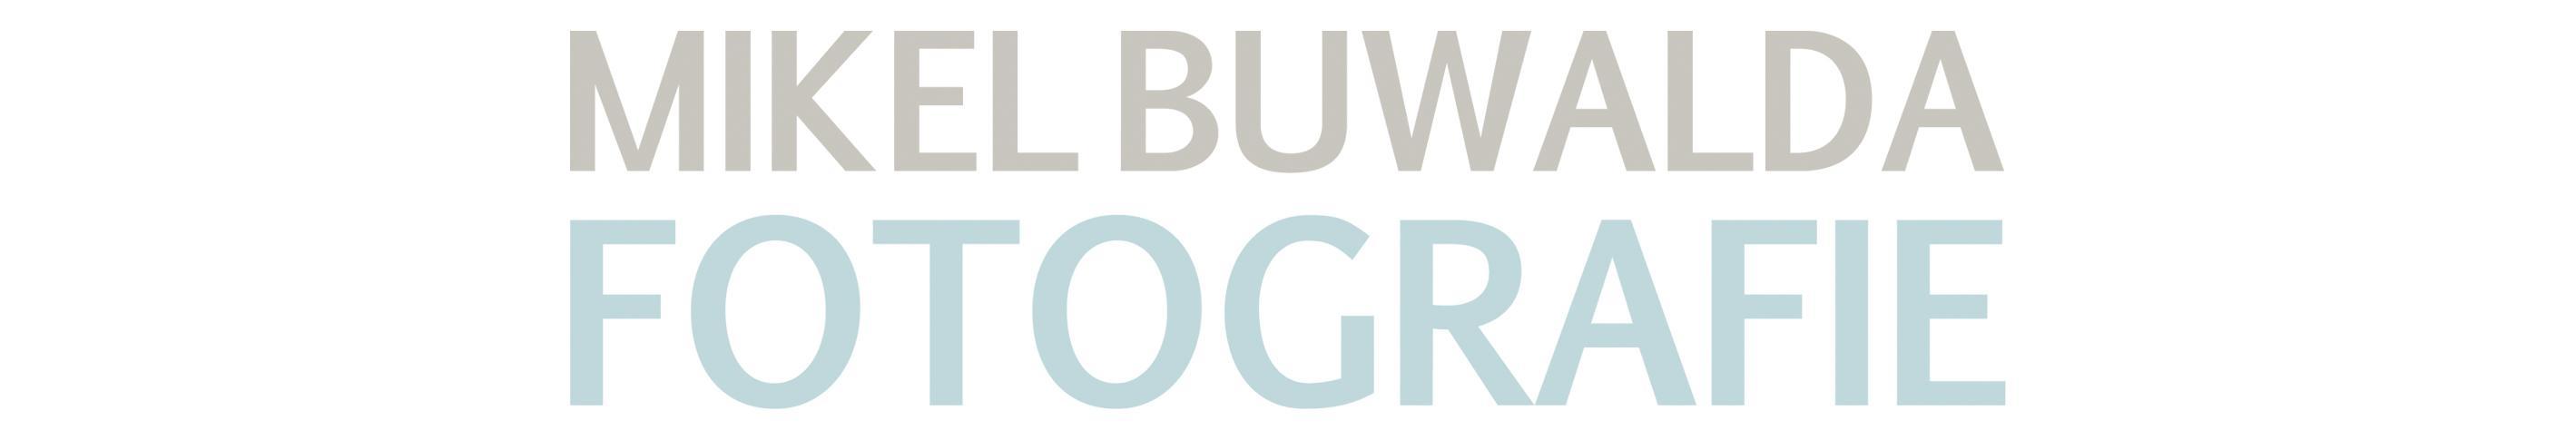 Mikel Buwalda Fotografie Mobile Logo